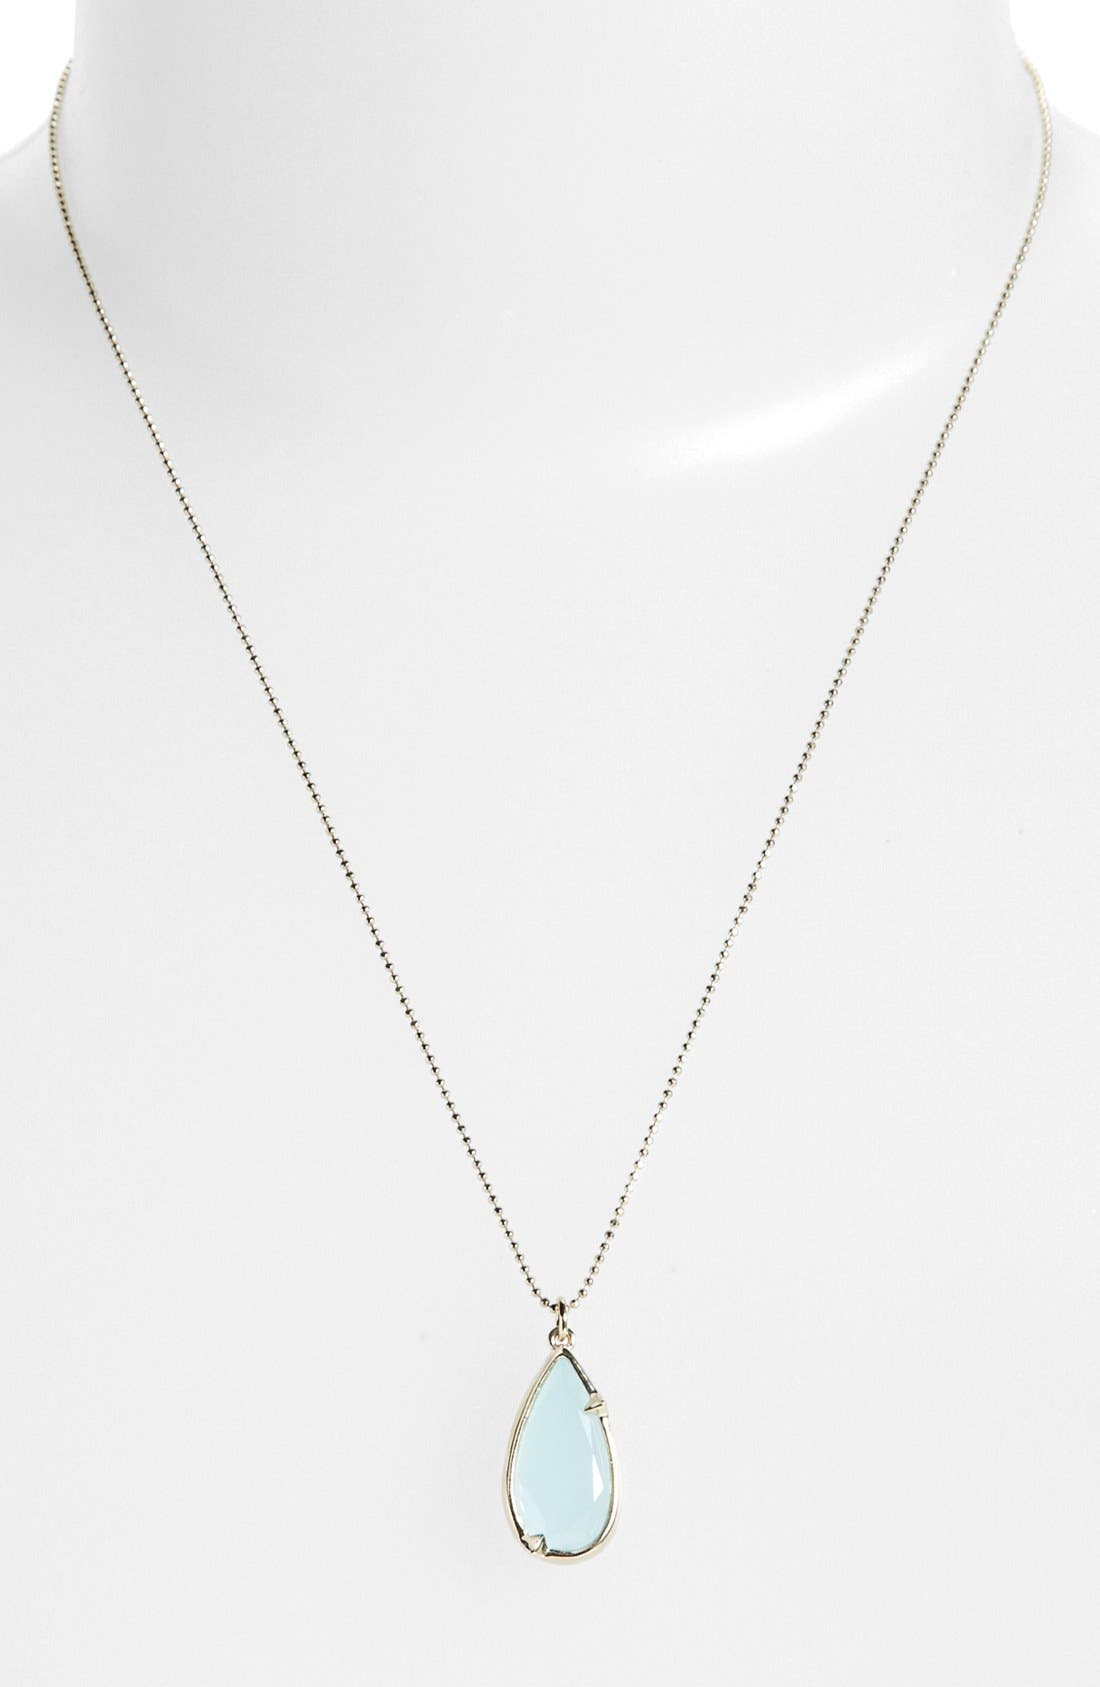 Main Image - Melinda Maria 'Thorn - Helena' Teardrop Pendant Necklace